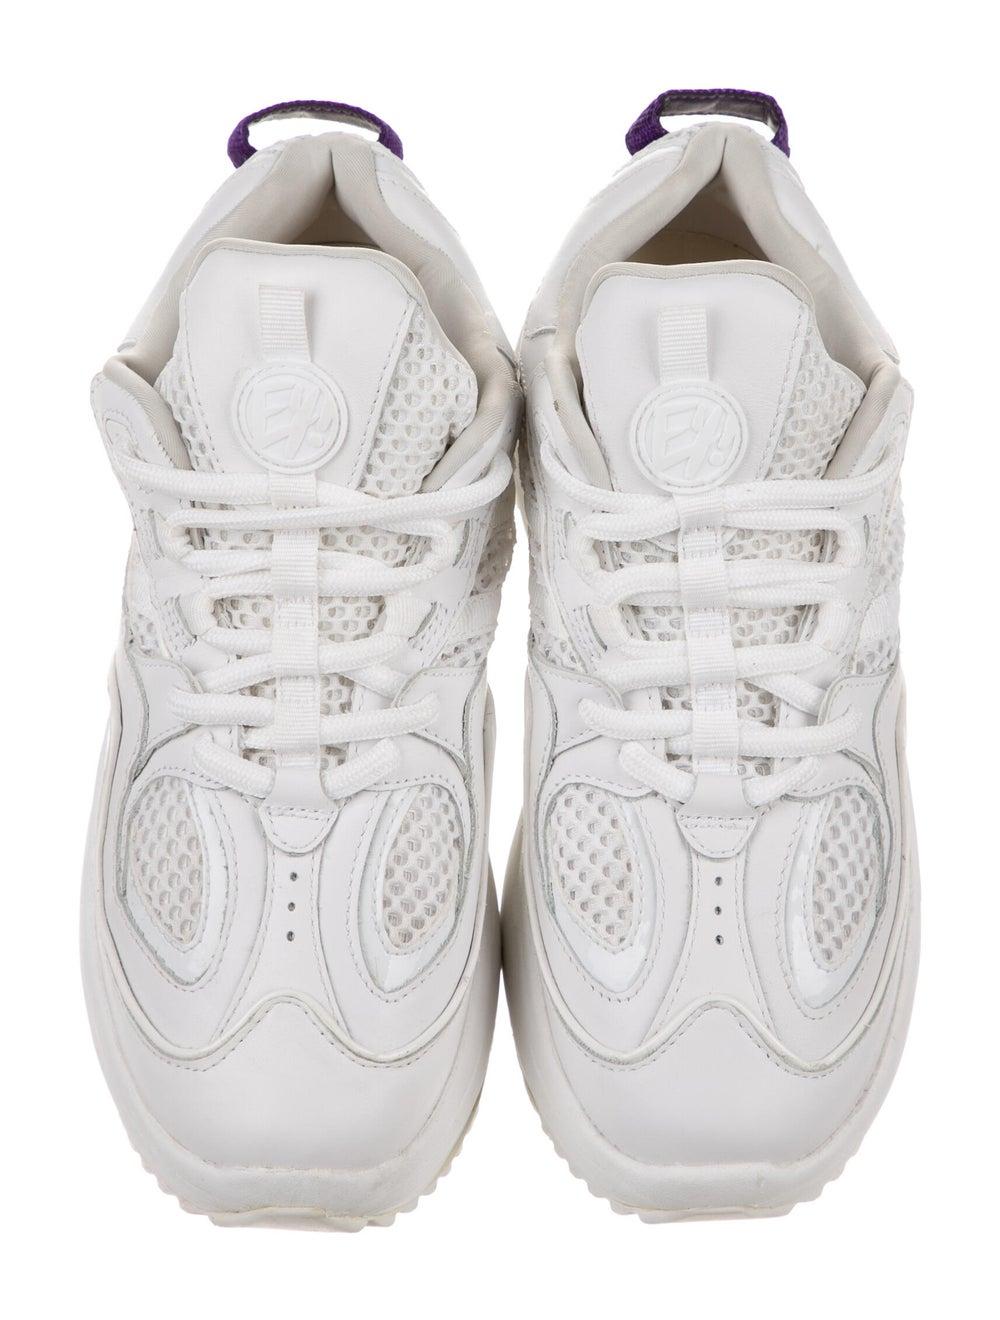 Eytys Snow Sneakers White - image 3